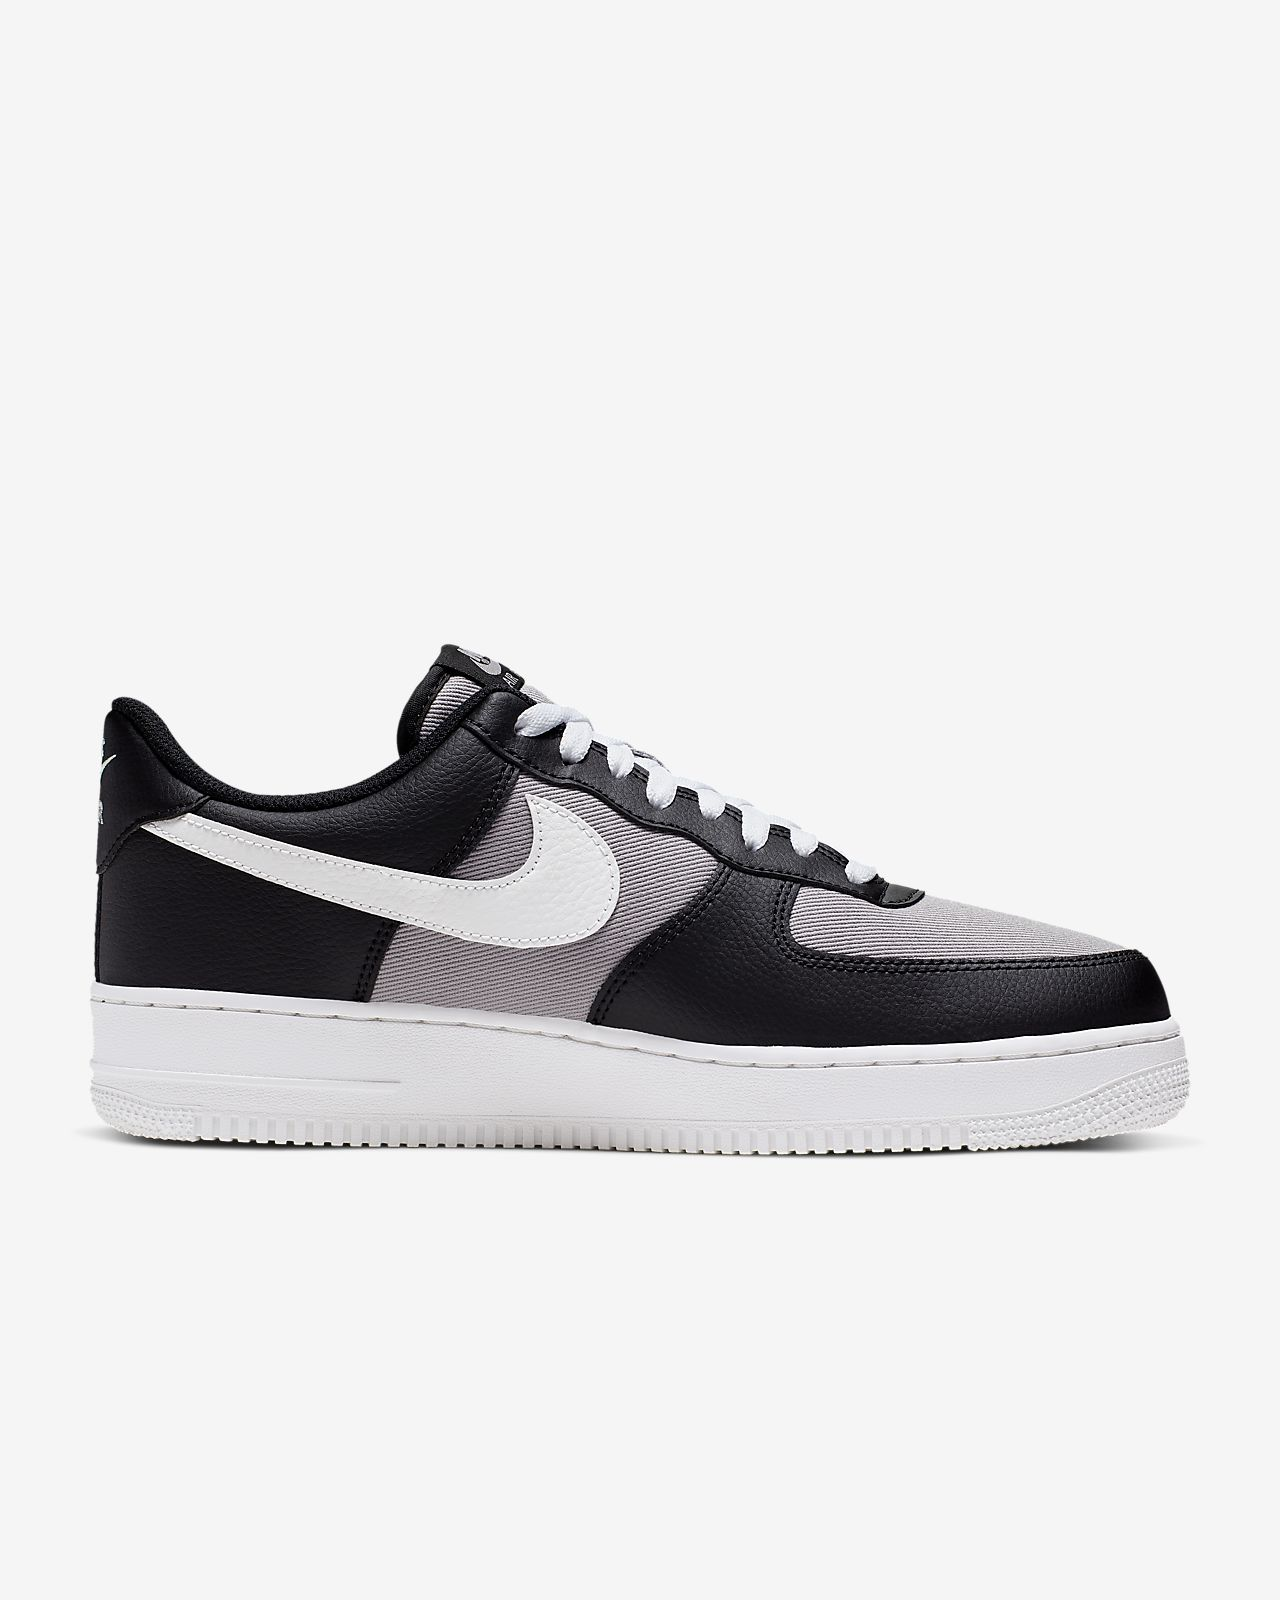 bien fuera x diferentemente Zapatillas 2018 Nike Air Force 1 '07 Men's Shoe